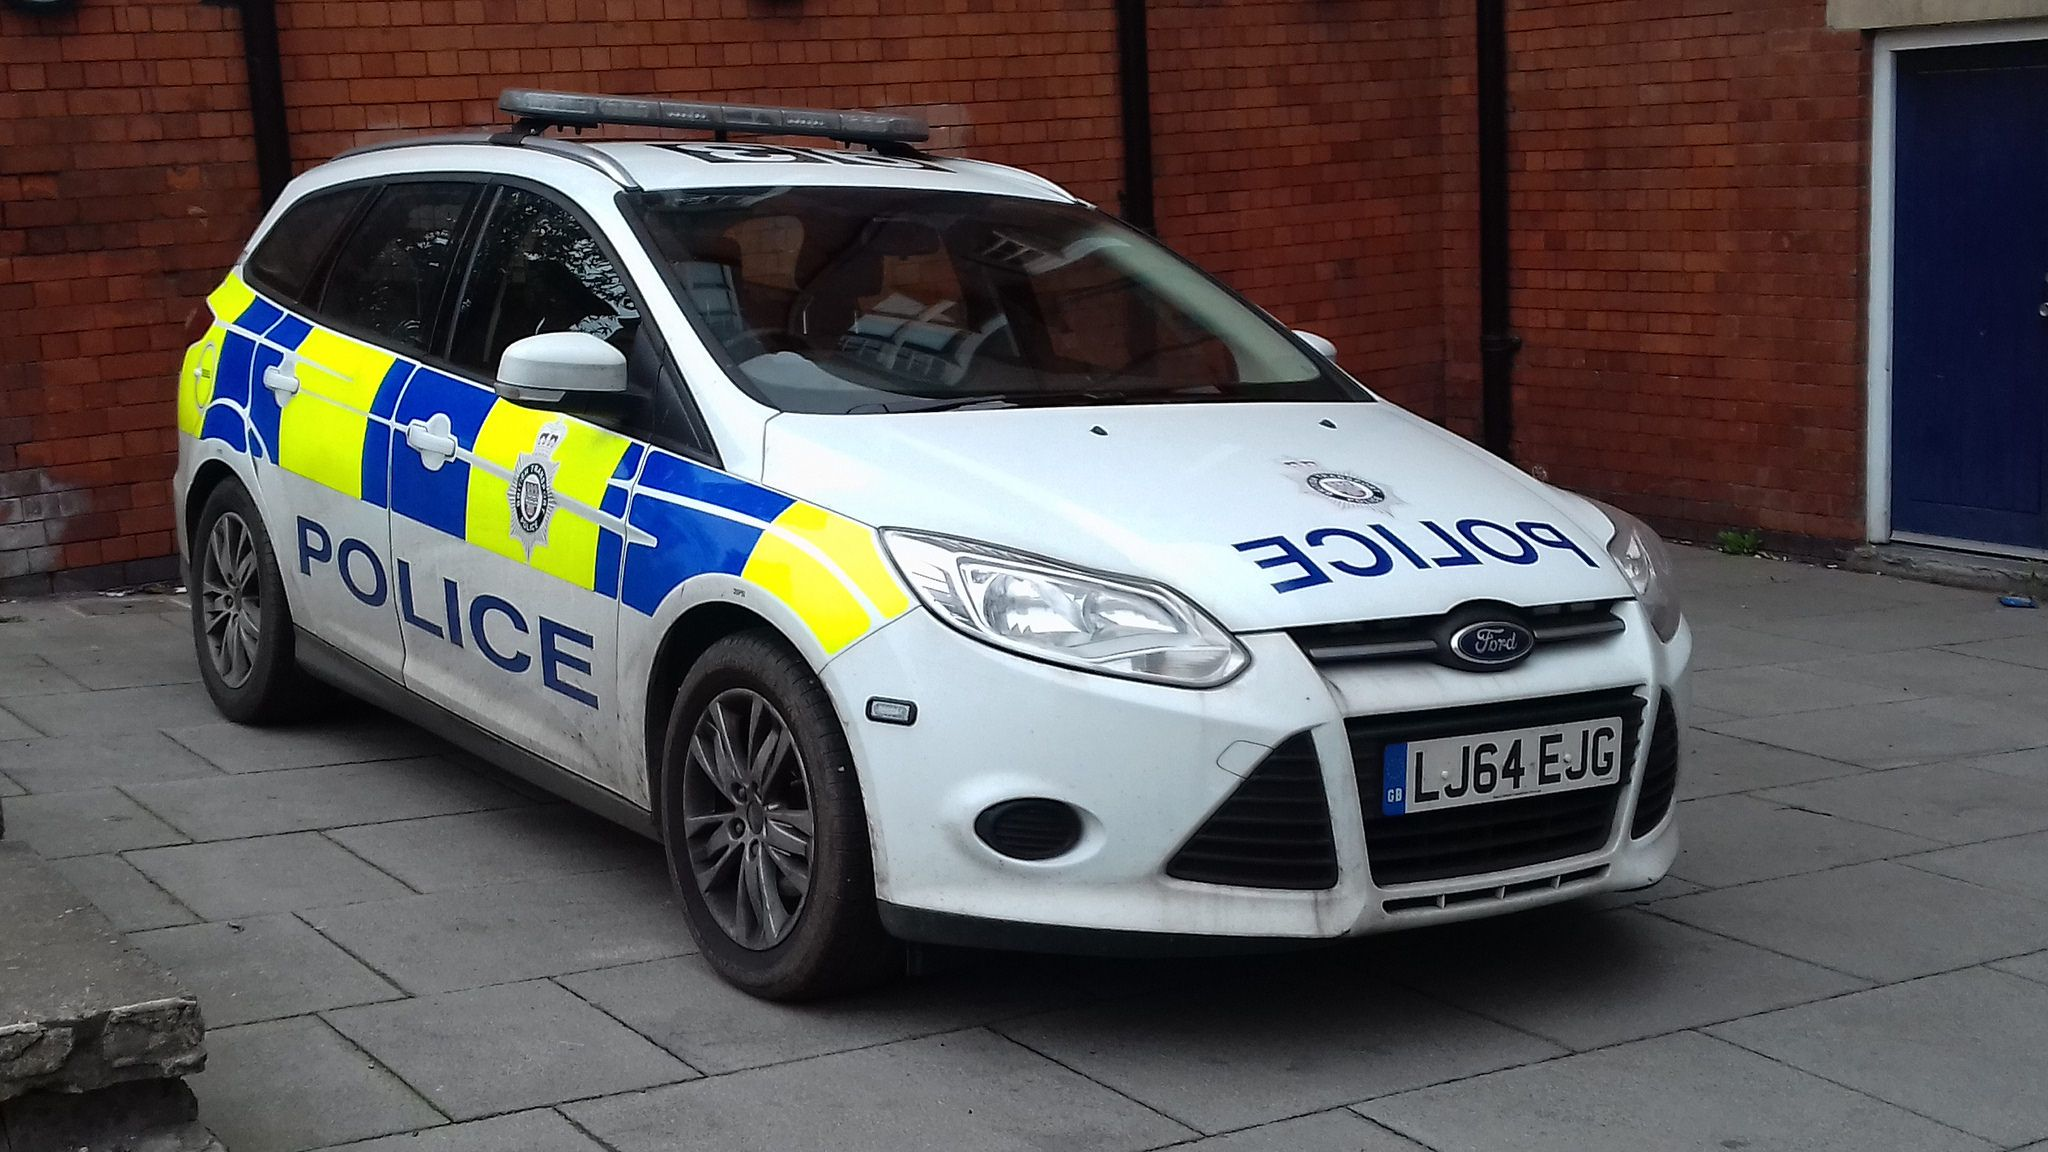 Lj64 Ejg Rescue Vehicles Police Cars Ford